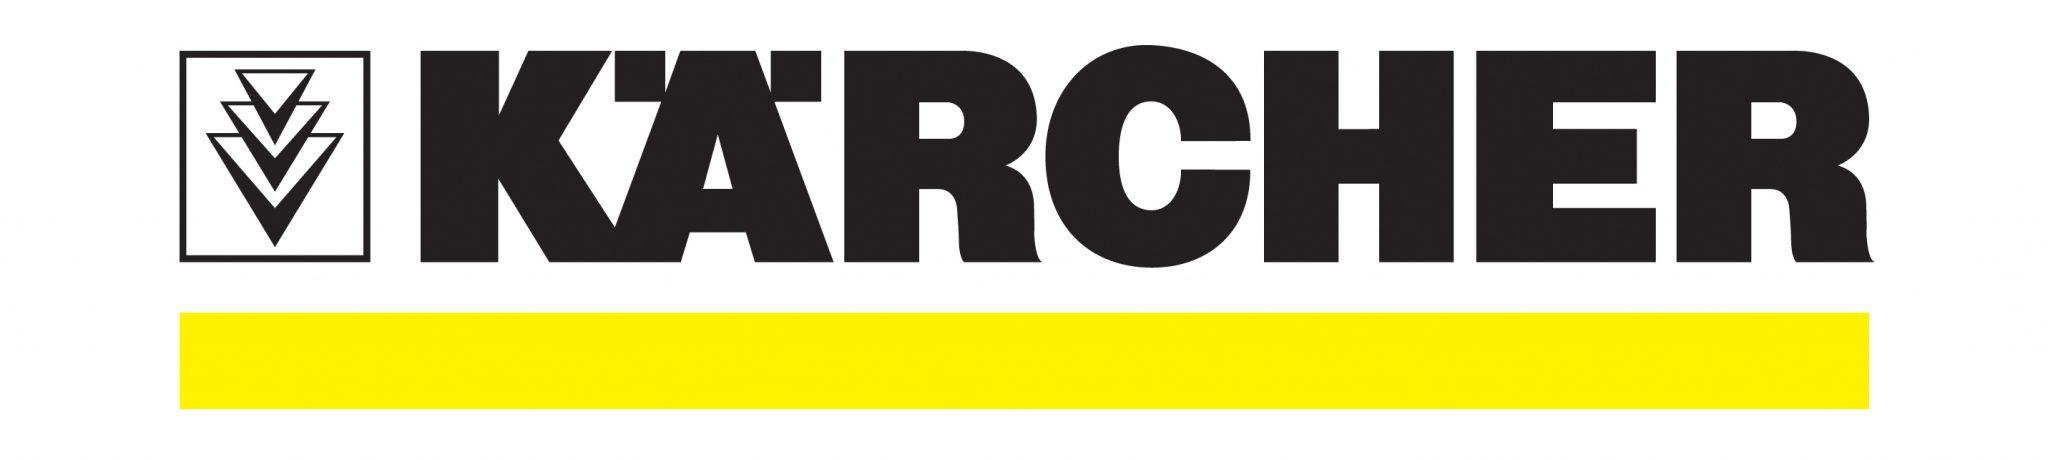 лого Керхер